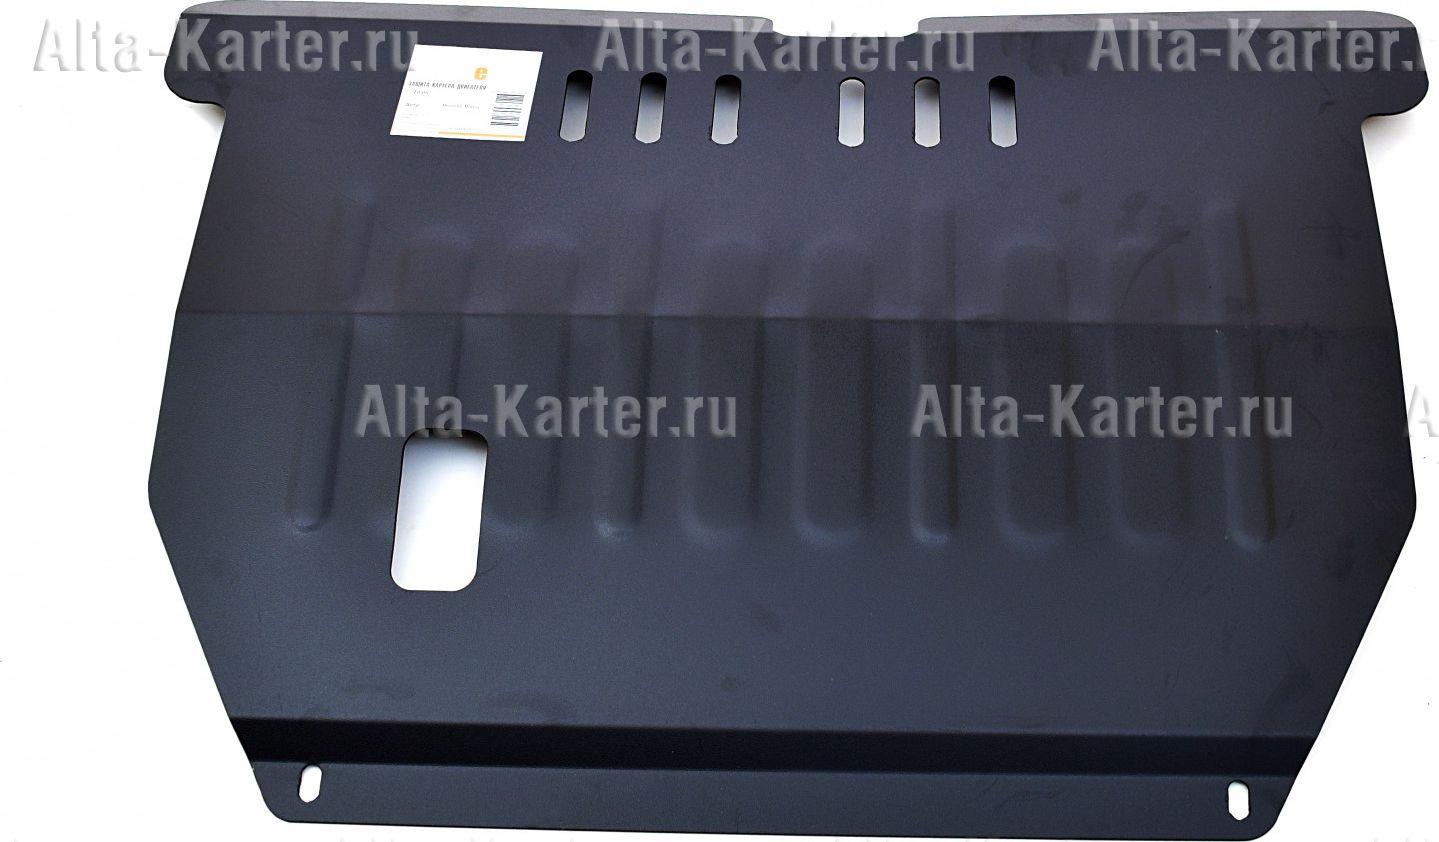 Защита Alfeco для картера и КПП Hyundai Matrix 2001-2010. Артикул ALF.10.06